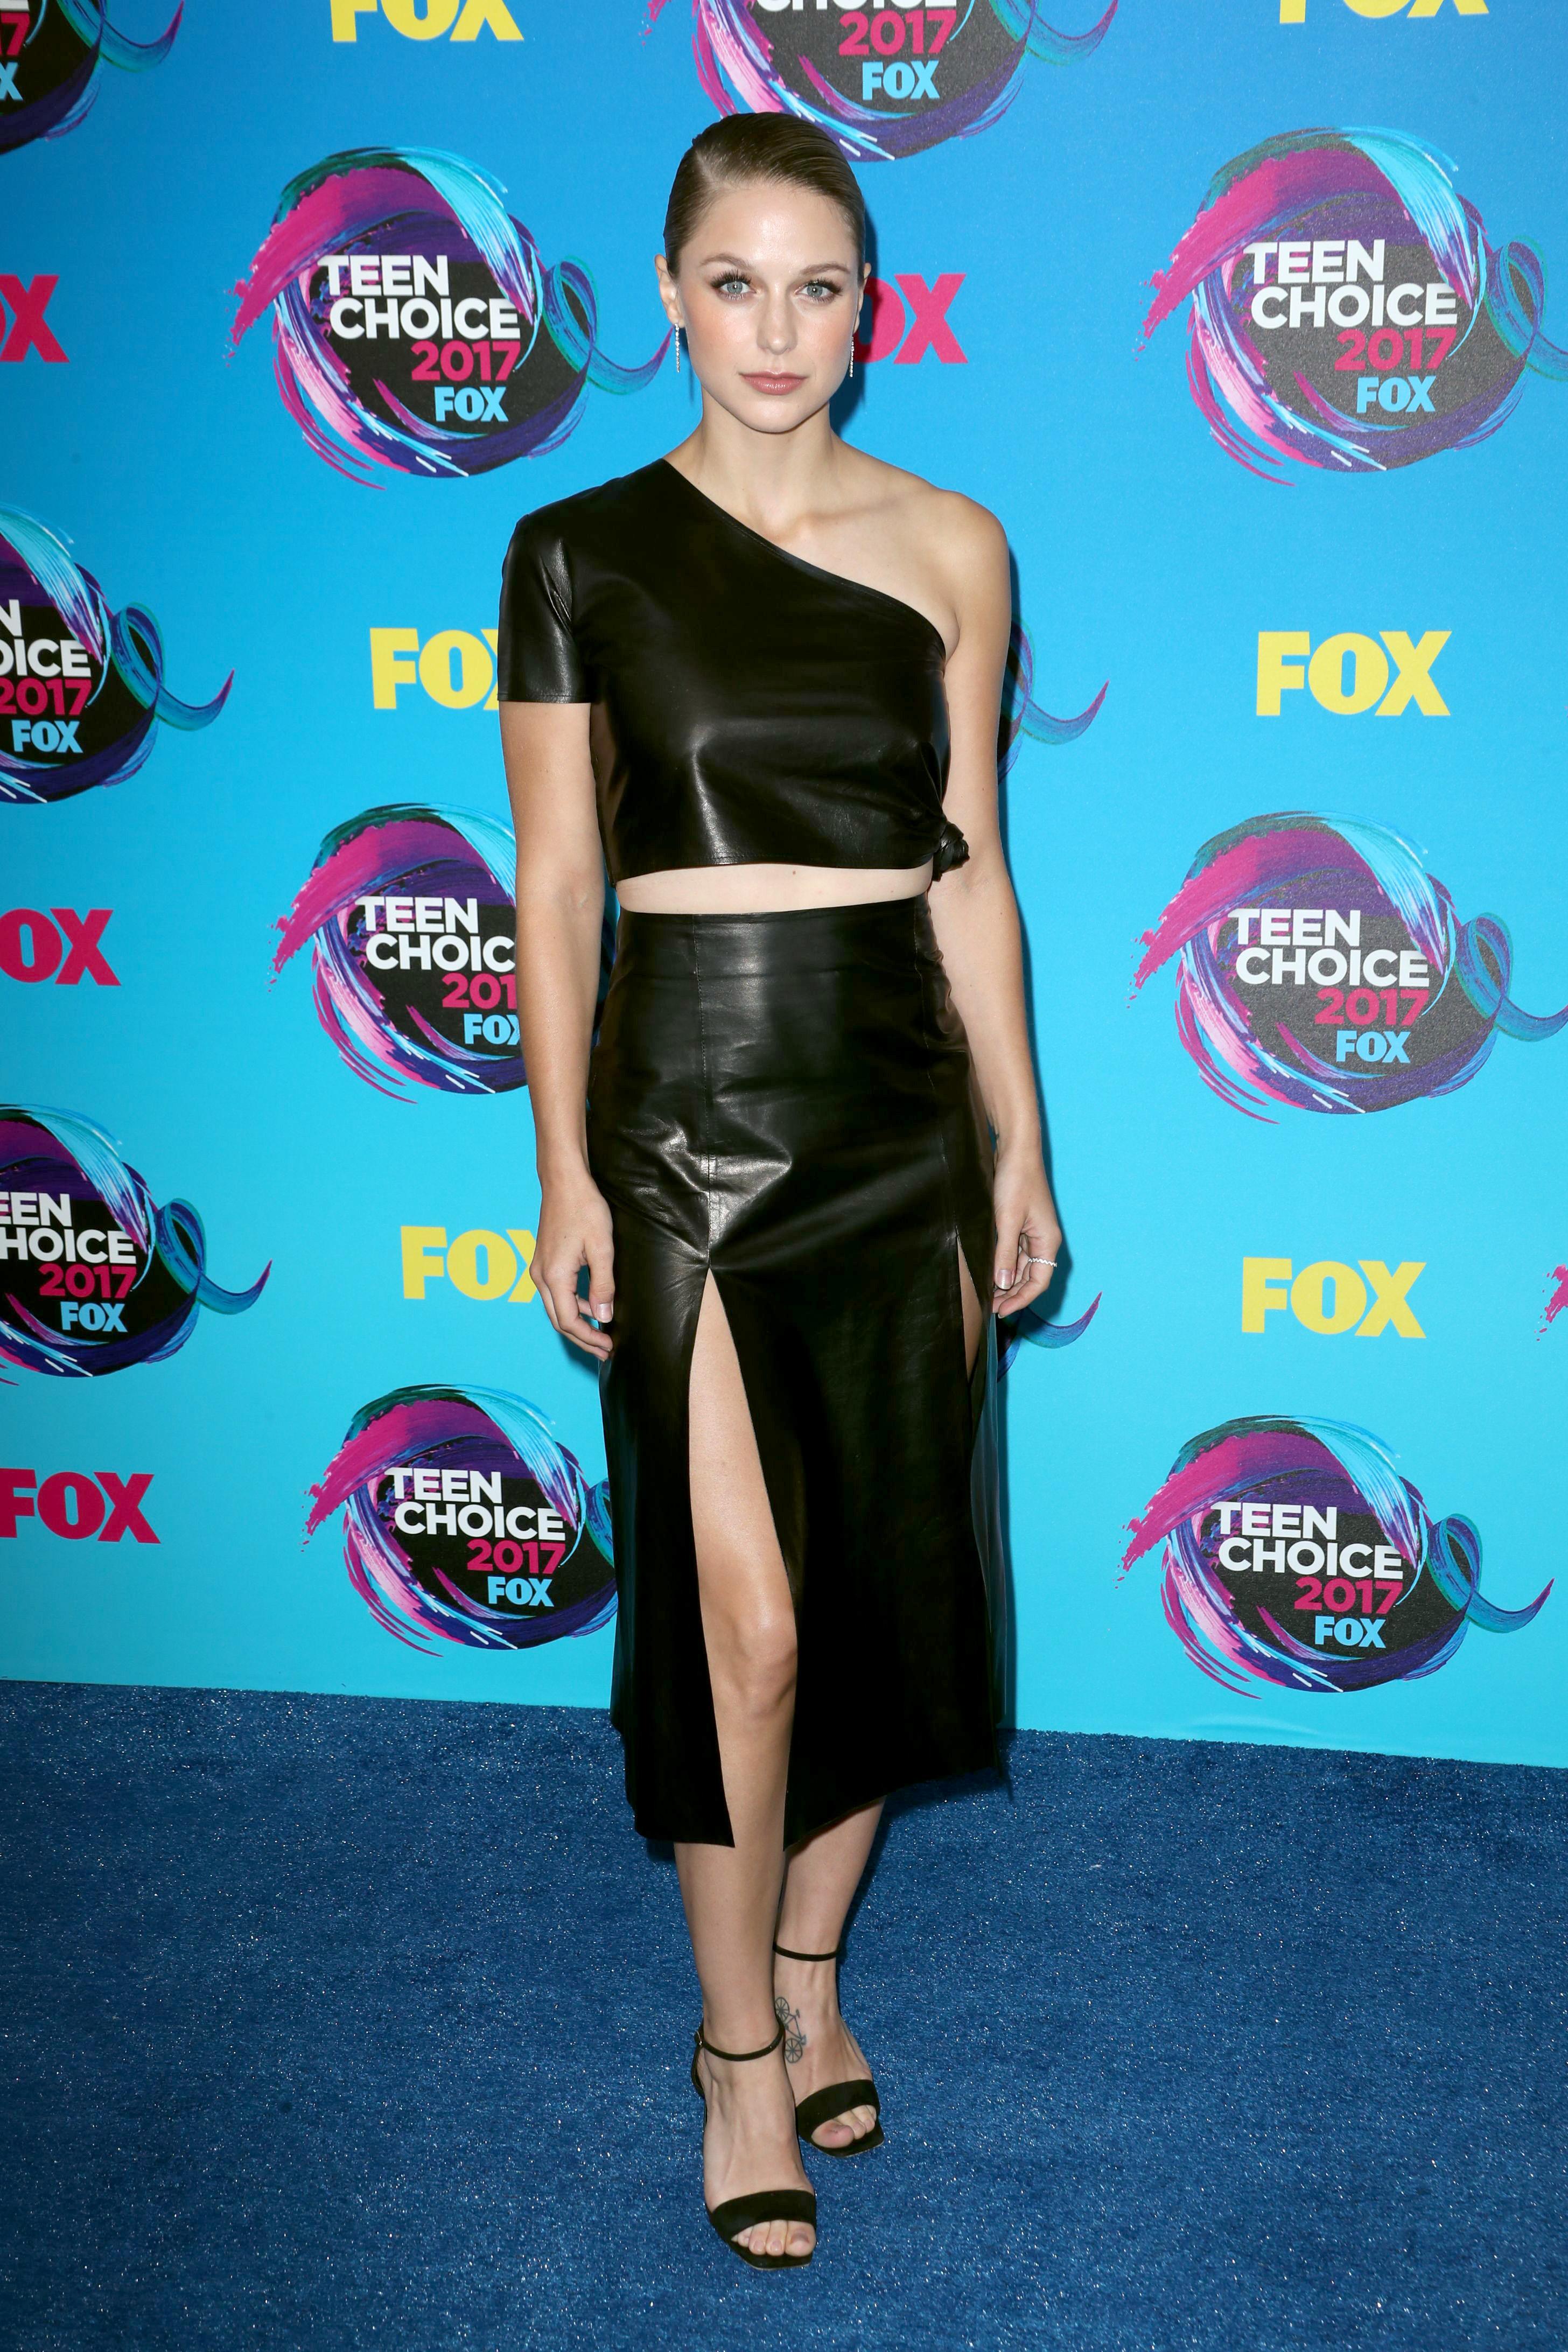 Melissa Benoist At The Teen Choice Awards